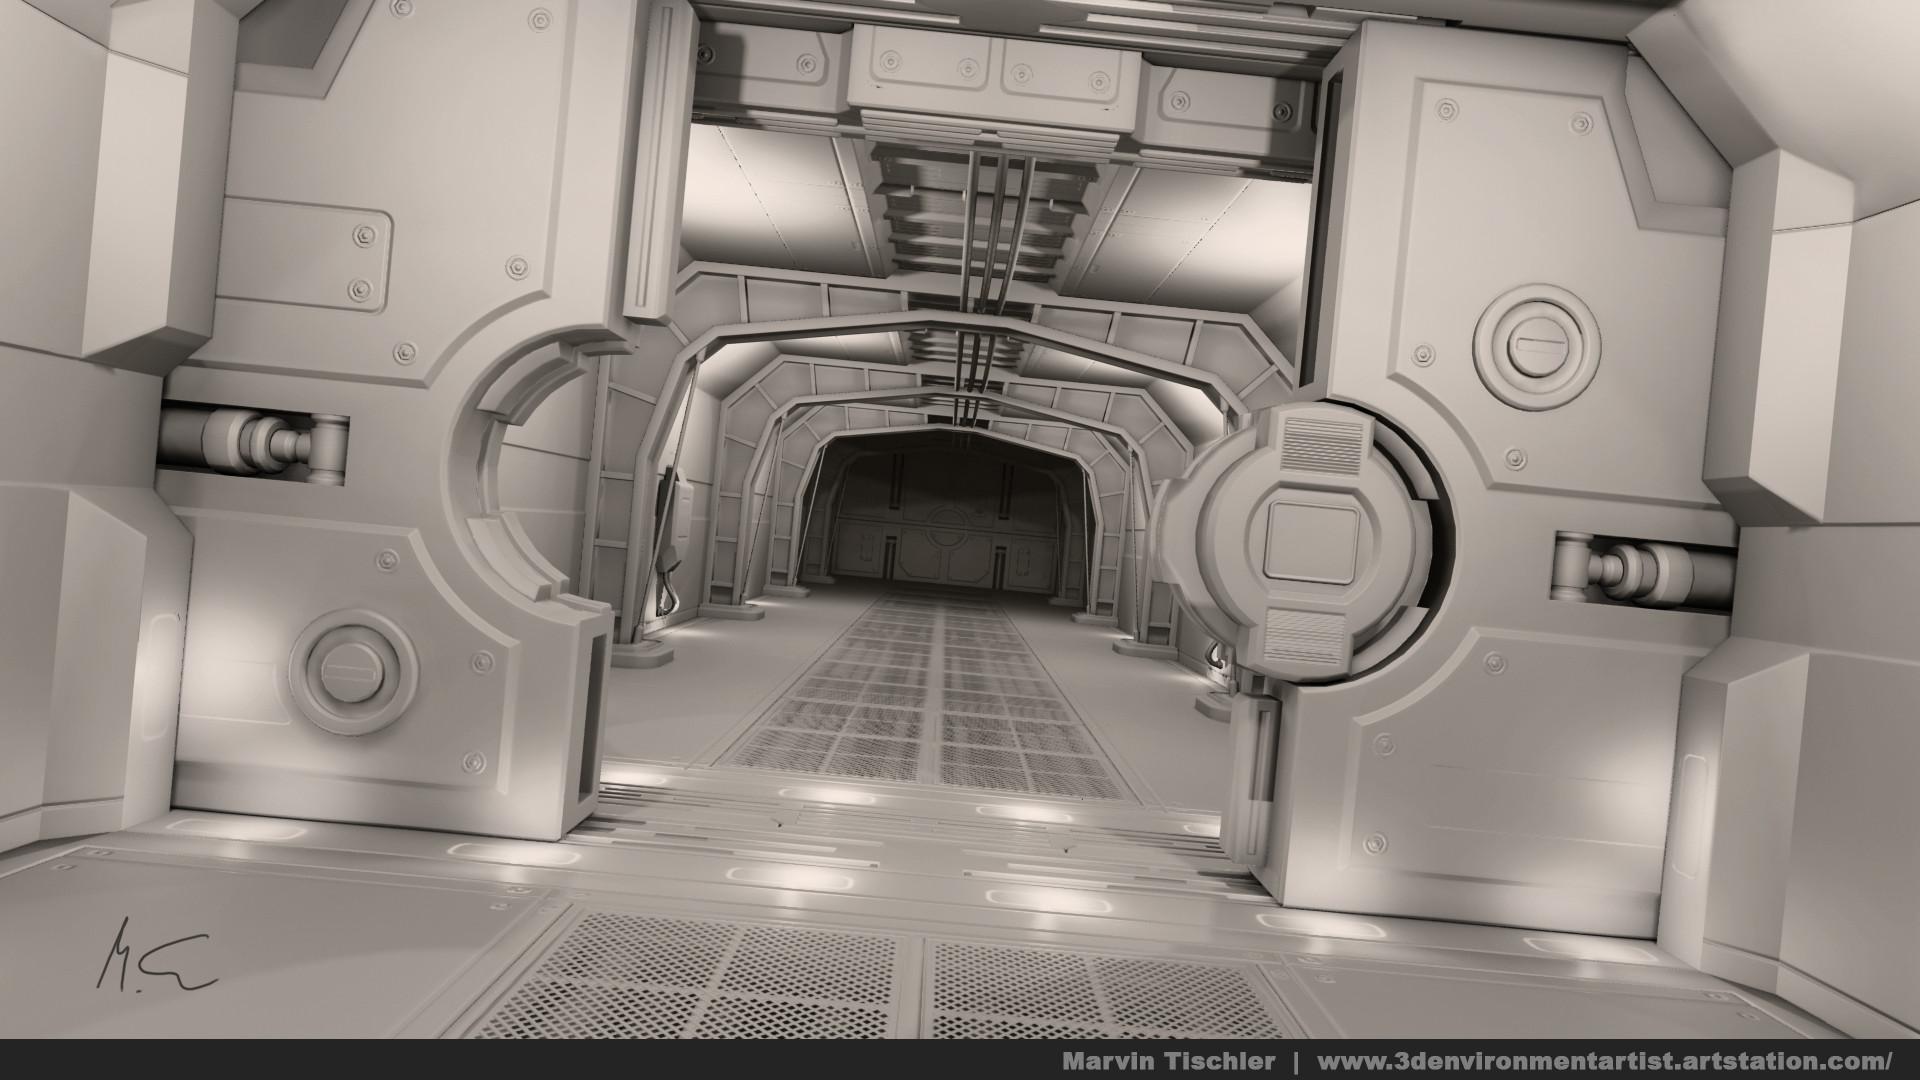 Marvin tischler hallway scifi 001 e